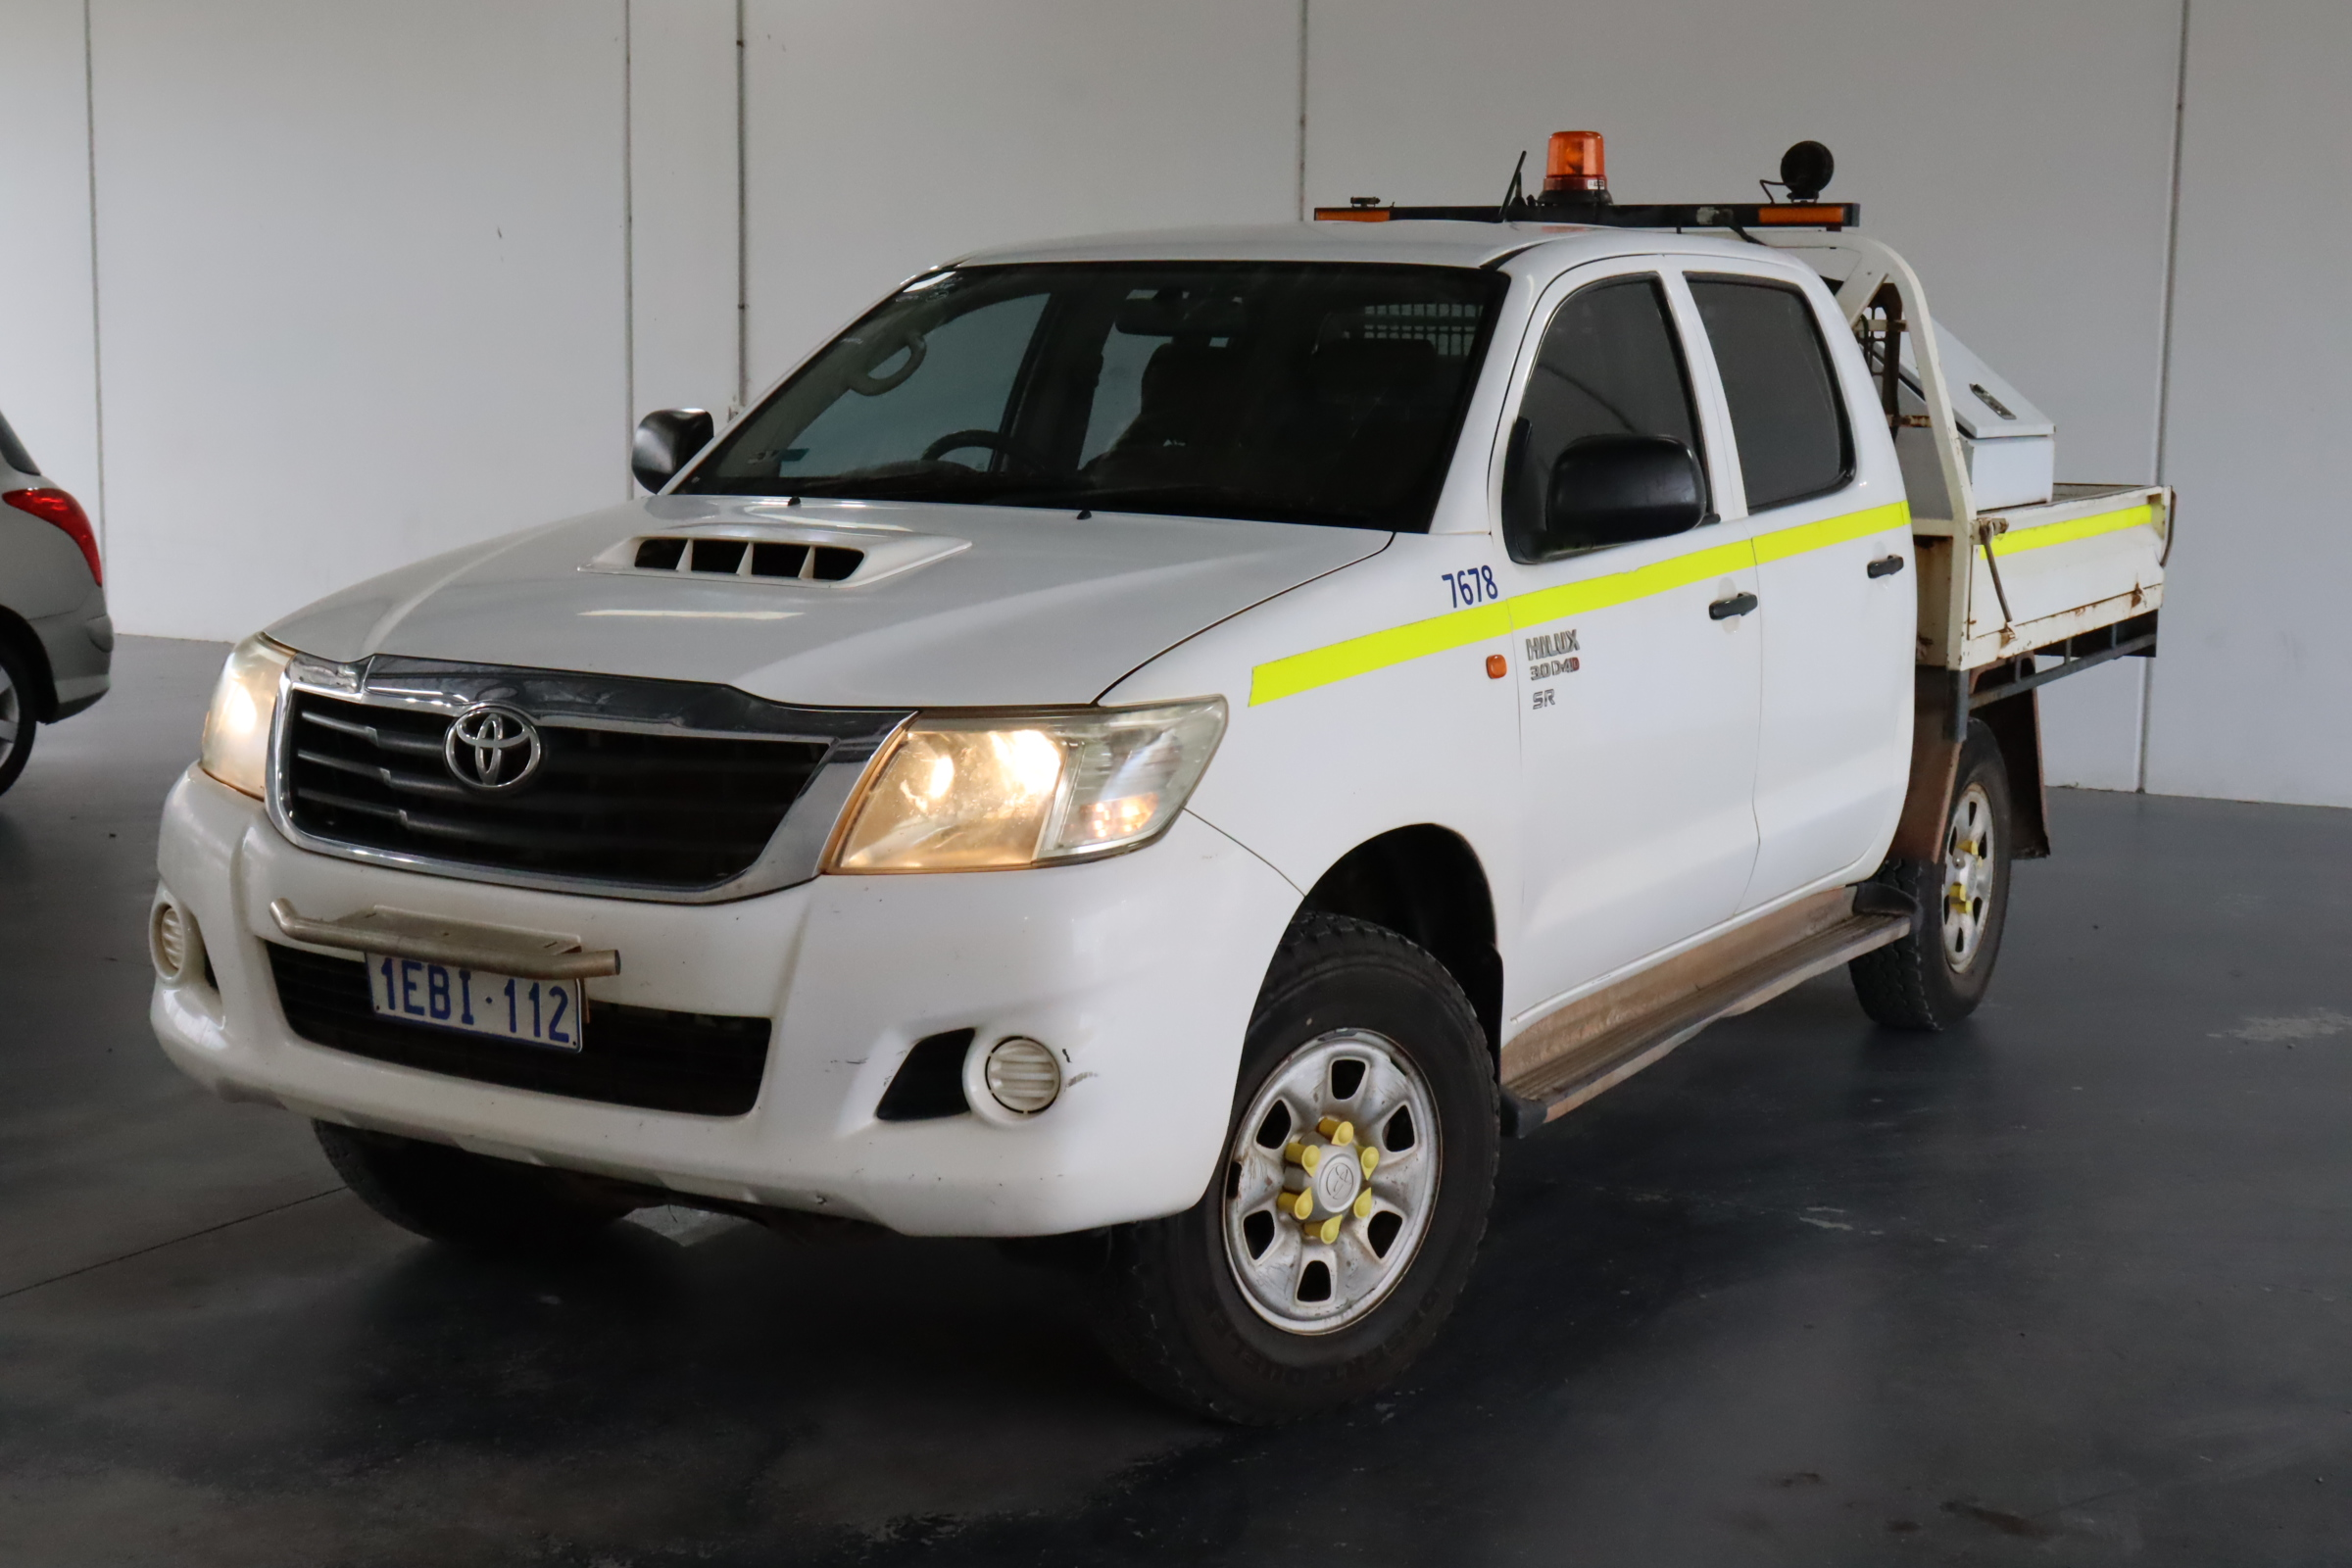 2012 Toyota Hilux 4X4 SR KUN26R Turbo Diesel Manual Crew Cab Chassis